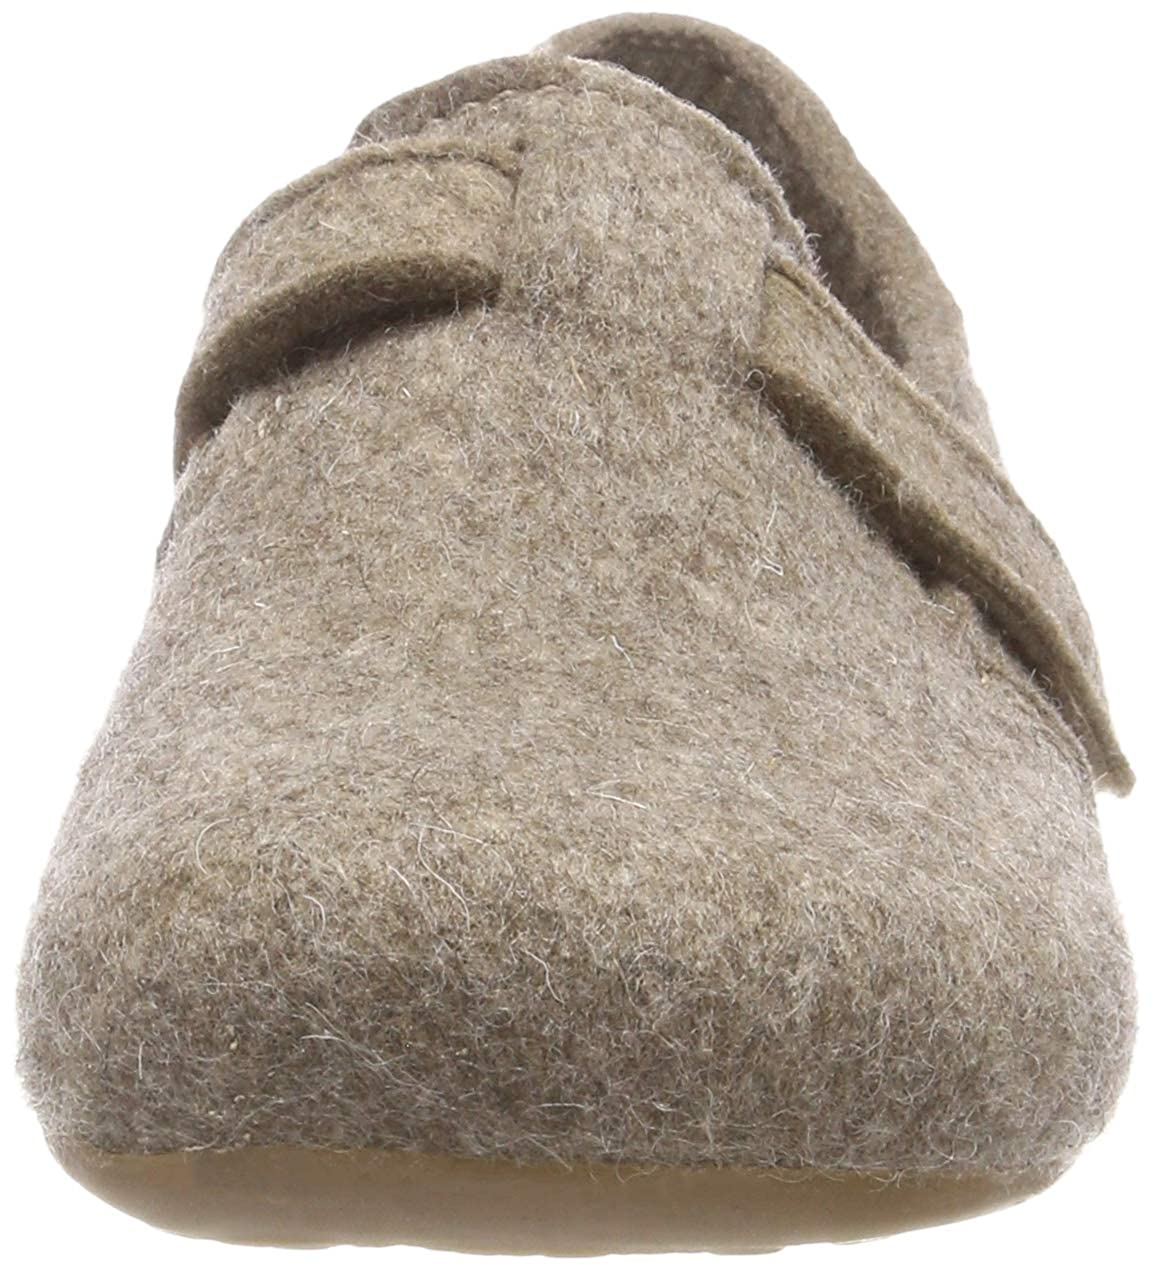 Haflinger Unisex-Erwachsene Unisex-Erwachsene Haflinger Focus Everest Niedrige Hausschuhe Beige (Torf 550) 7c100e